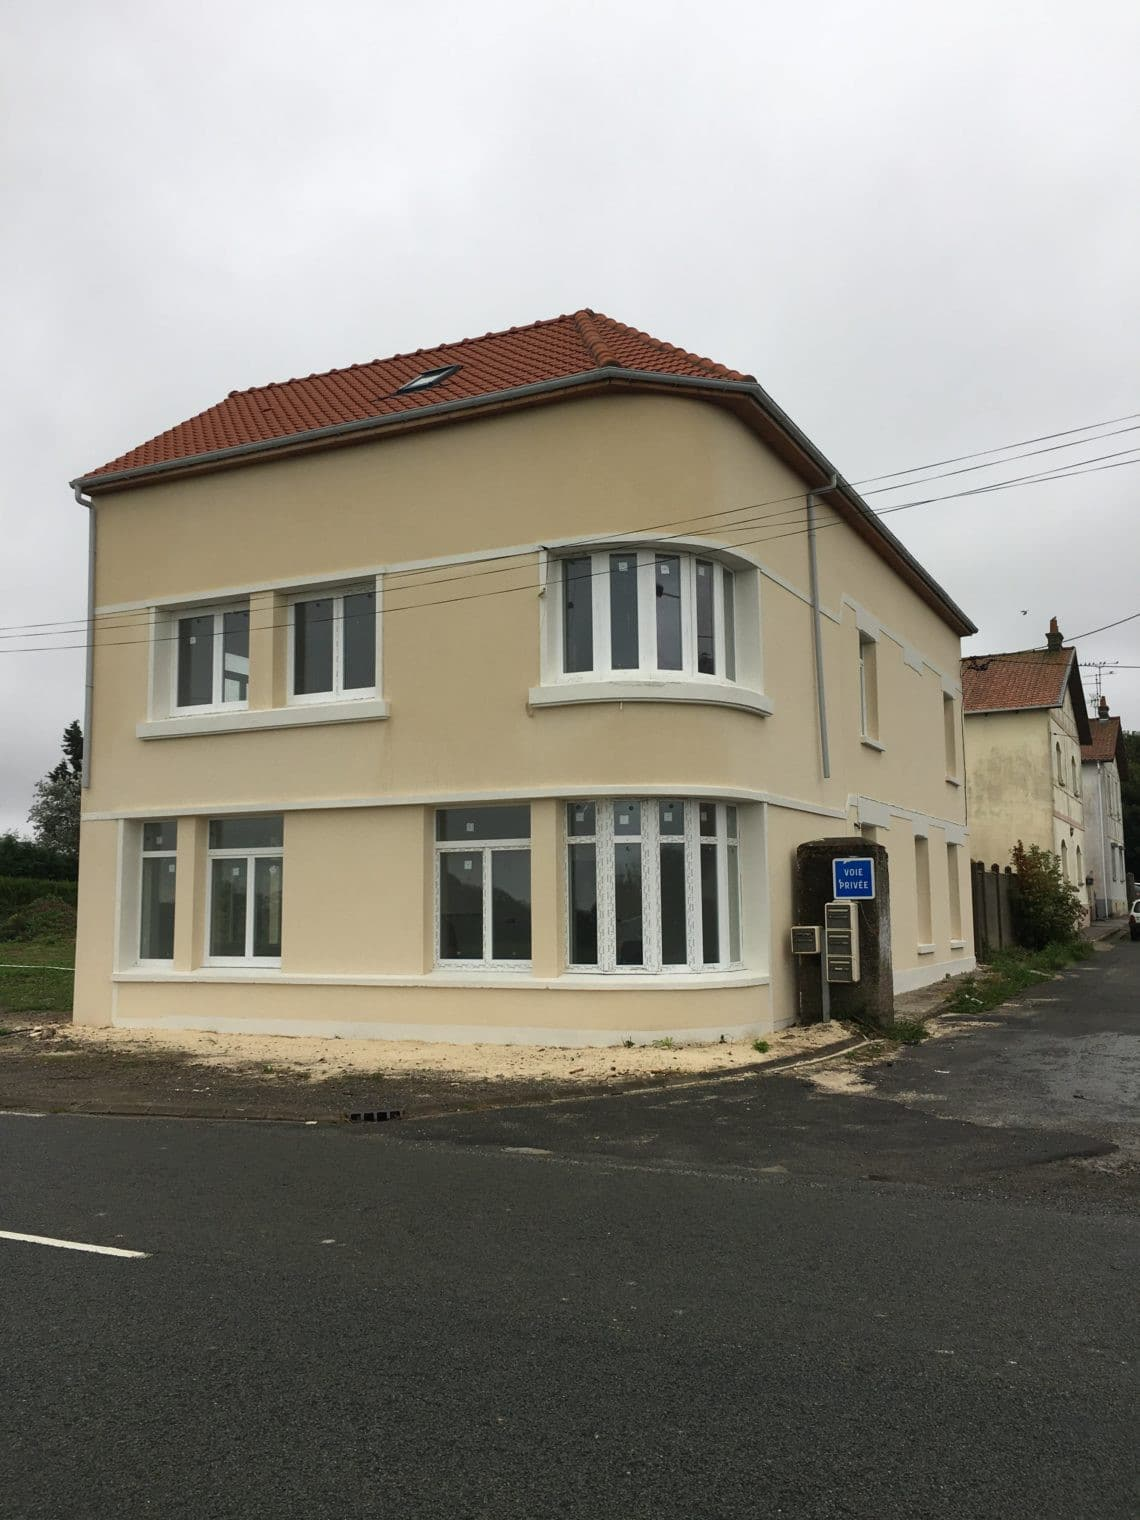 Urbel-Calais-ravalement-2-1140x1520.jpg